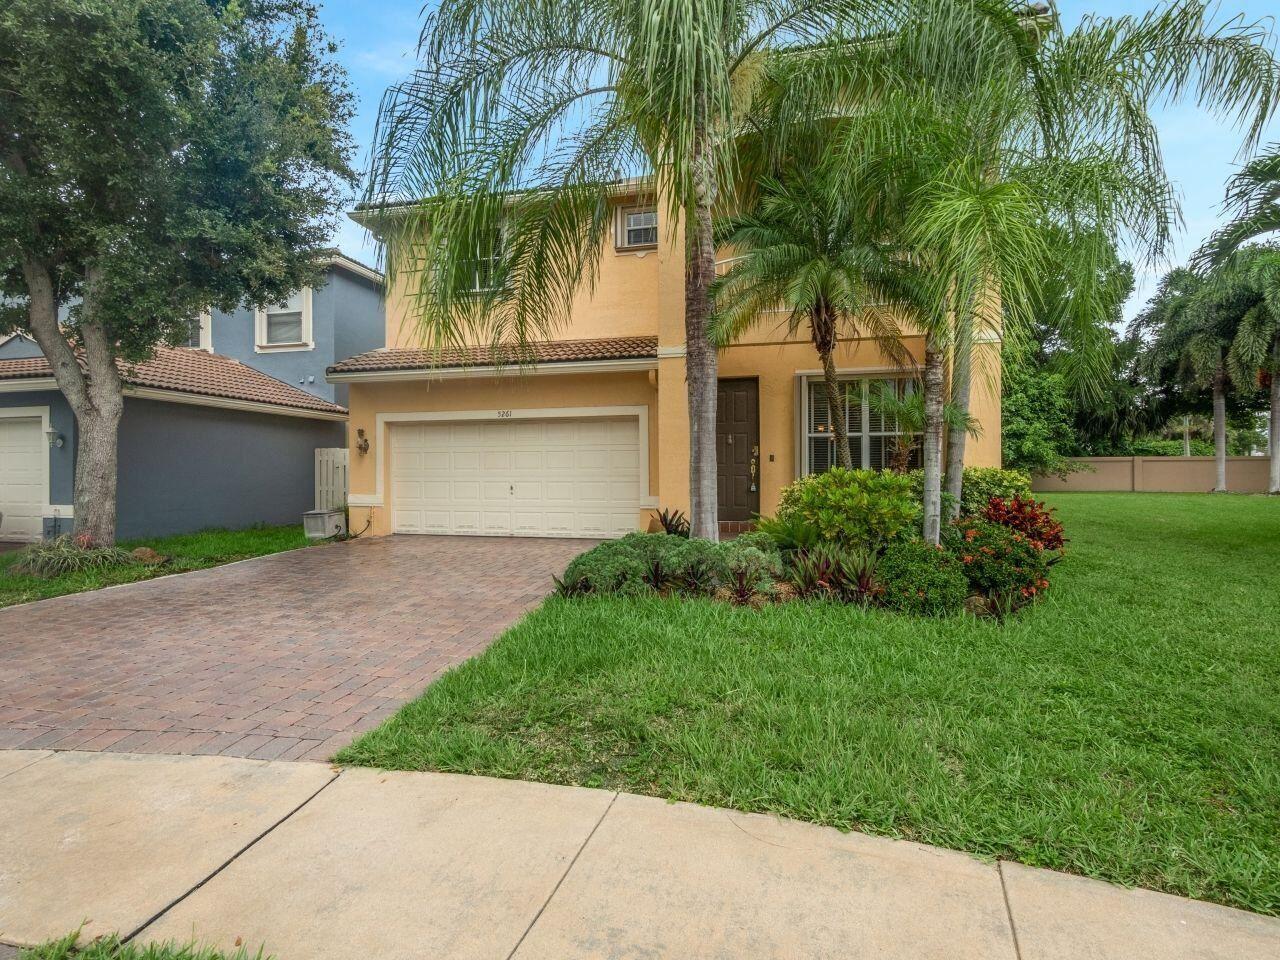 5261 Sancerre Circle, Lake Worth, FL 33463 - MLS#: RX-10732857